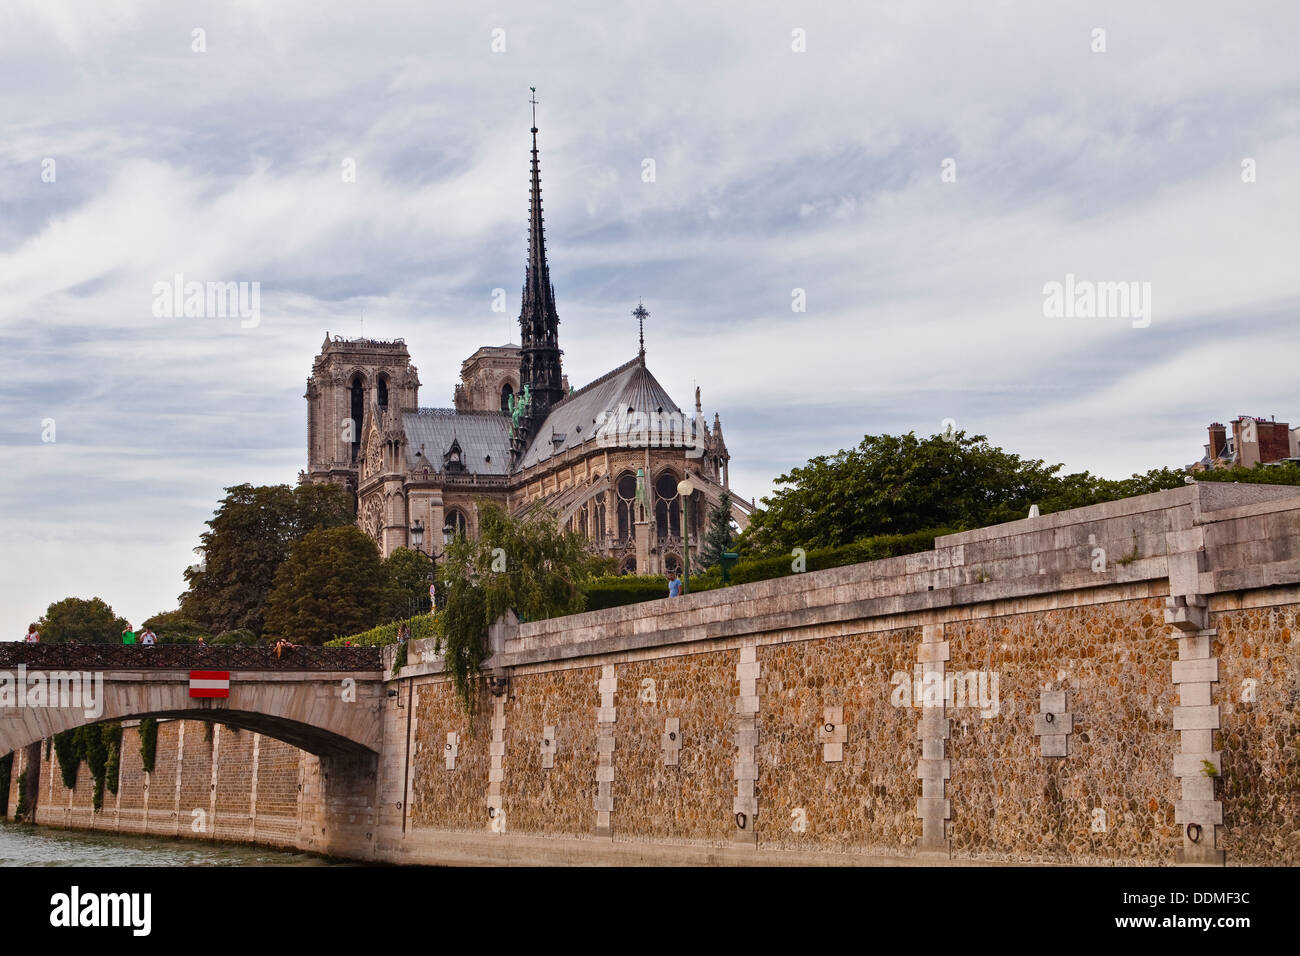 Notre Dame de Paris cathedral in France. - Stock Image